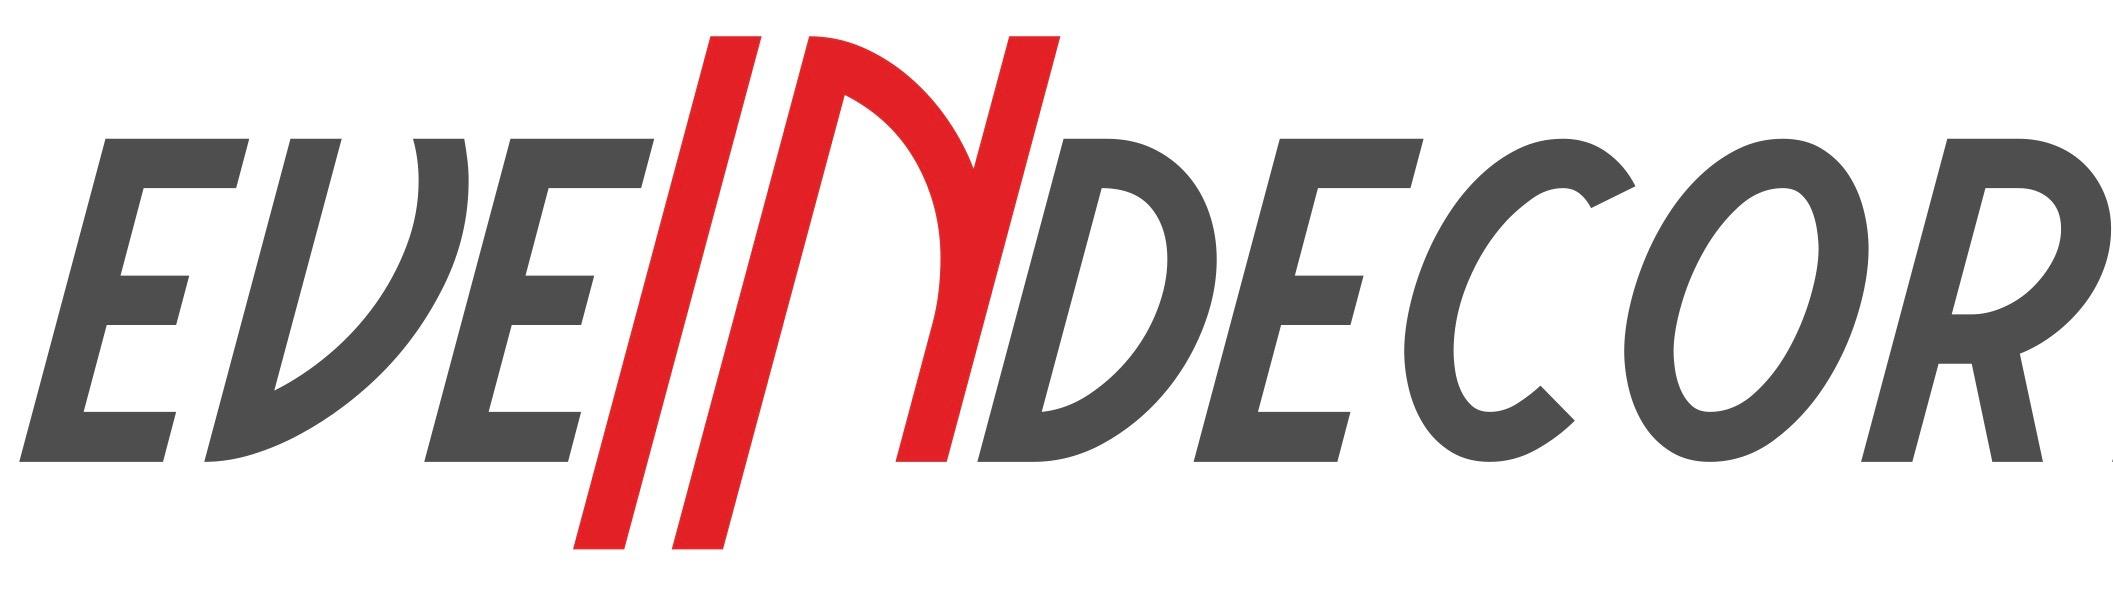 EVEINDECOR GmbH